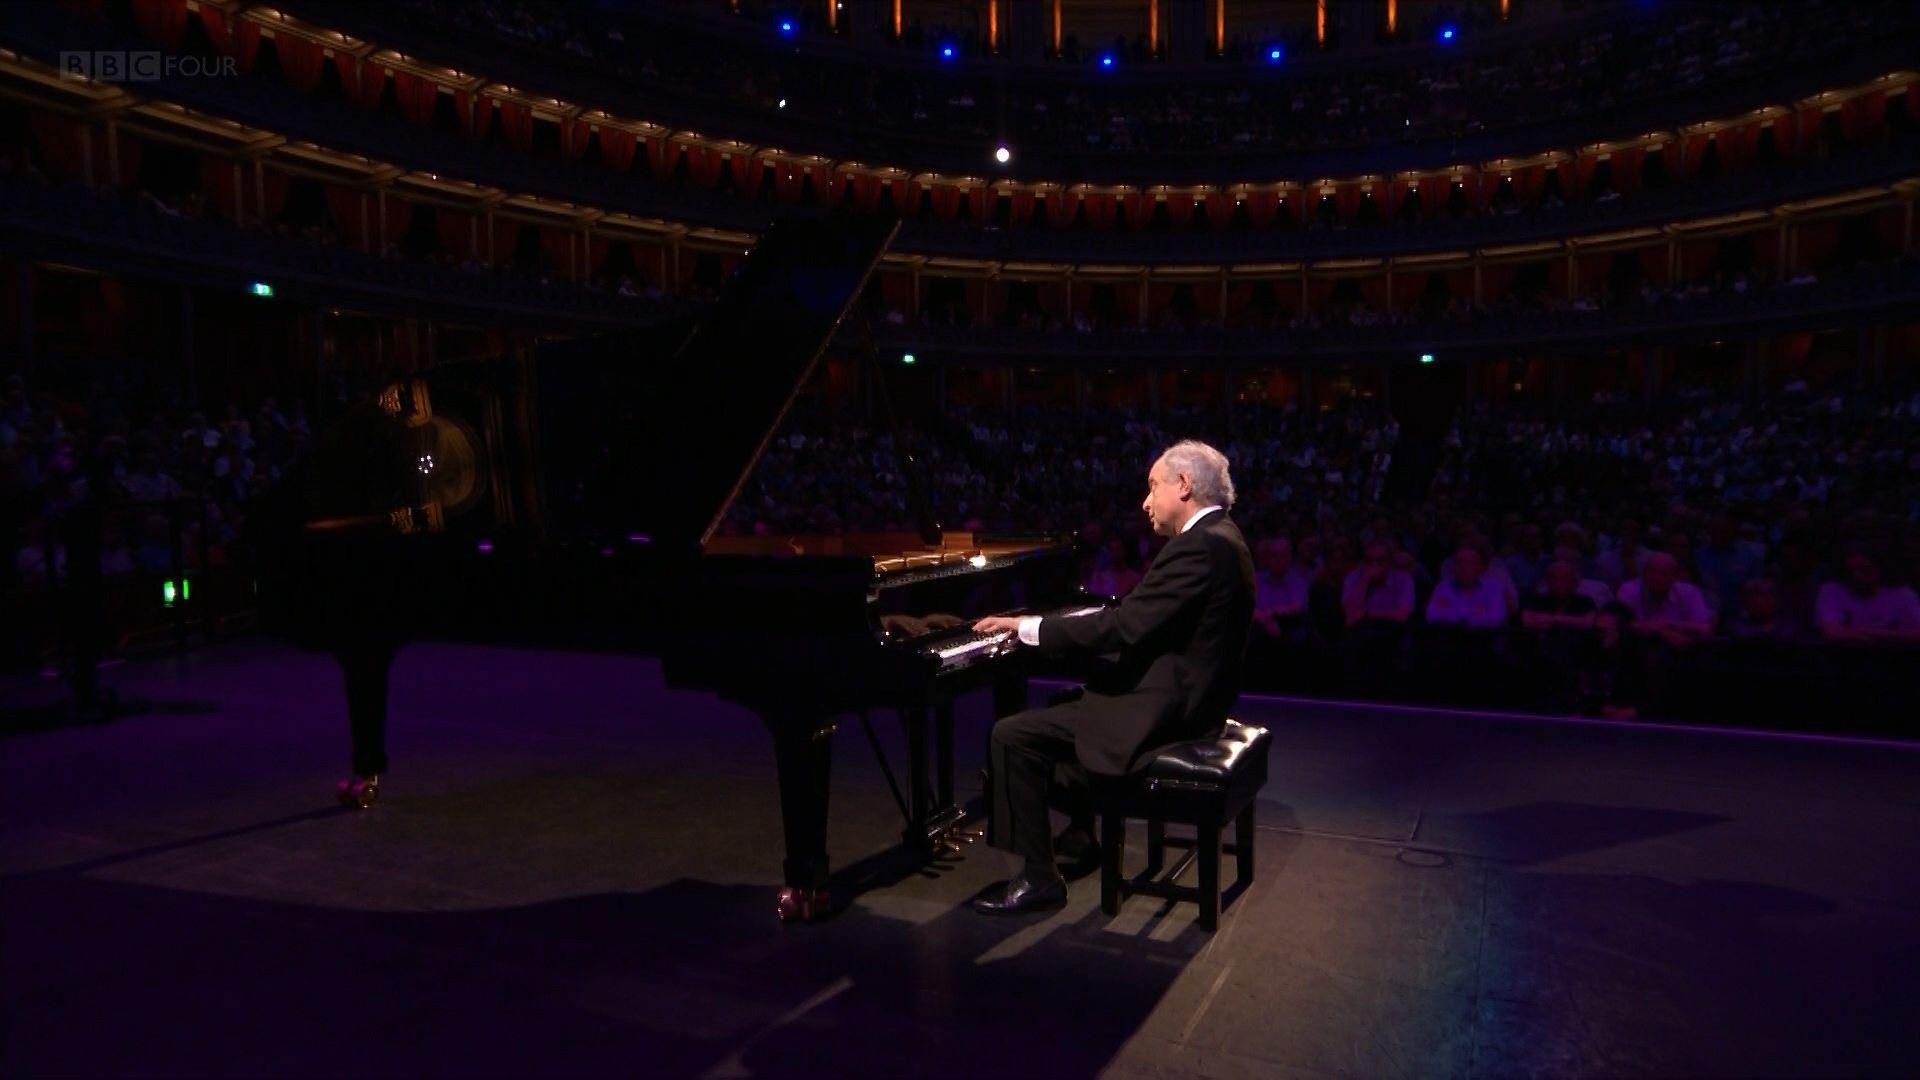 Johann Sebastian Bach: The Well-Tempered Clavier, Book I, BWV 846-869 – András Schiff